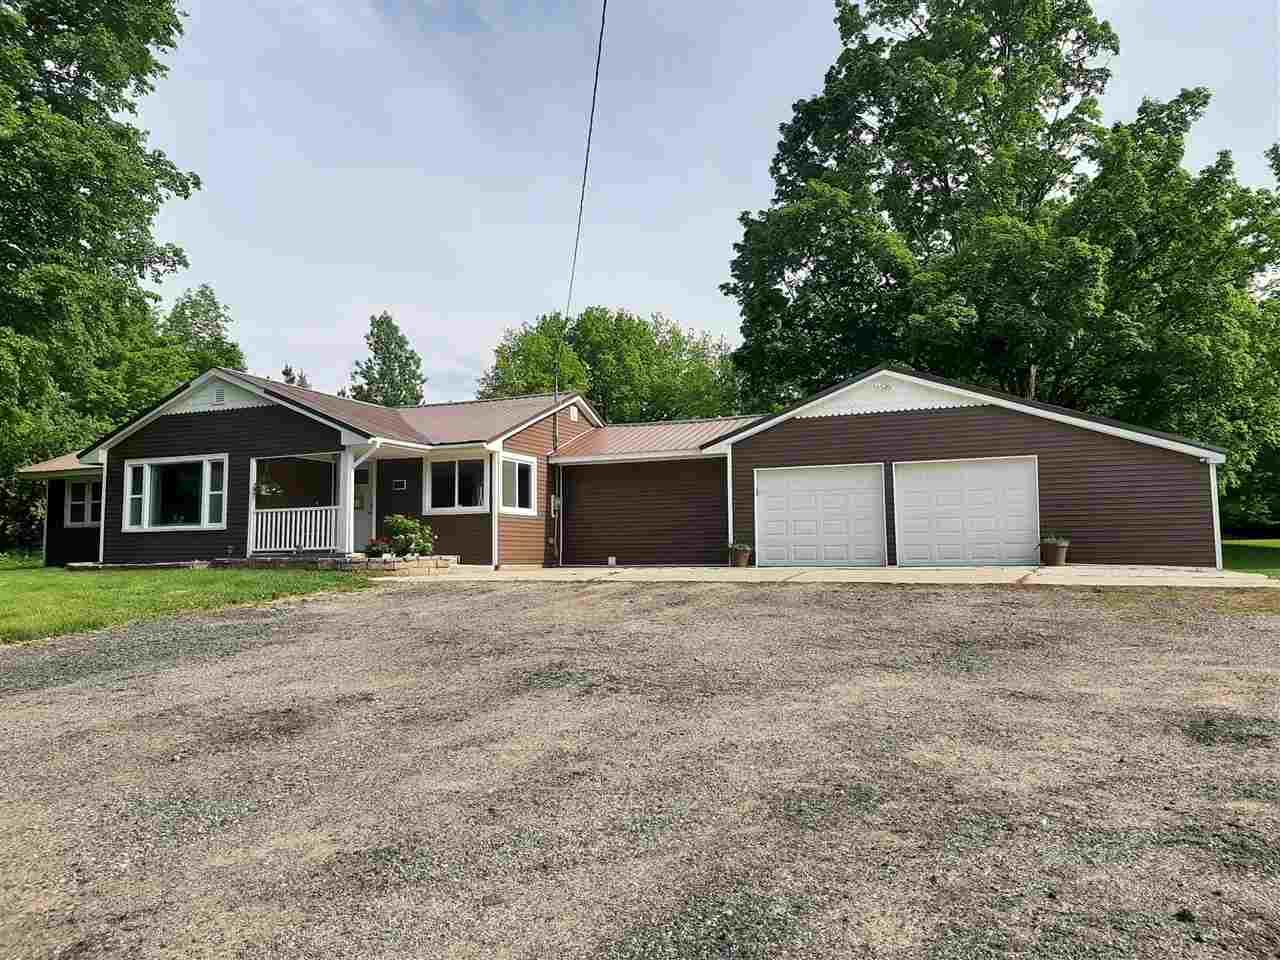 7720 Arnold Lake Rd, Harrison, MI